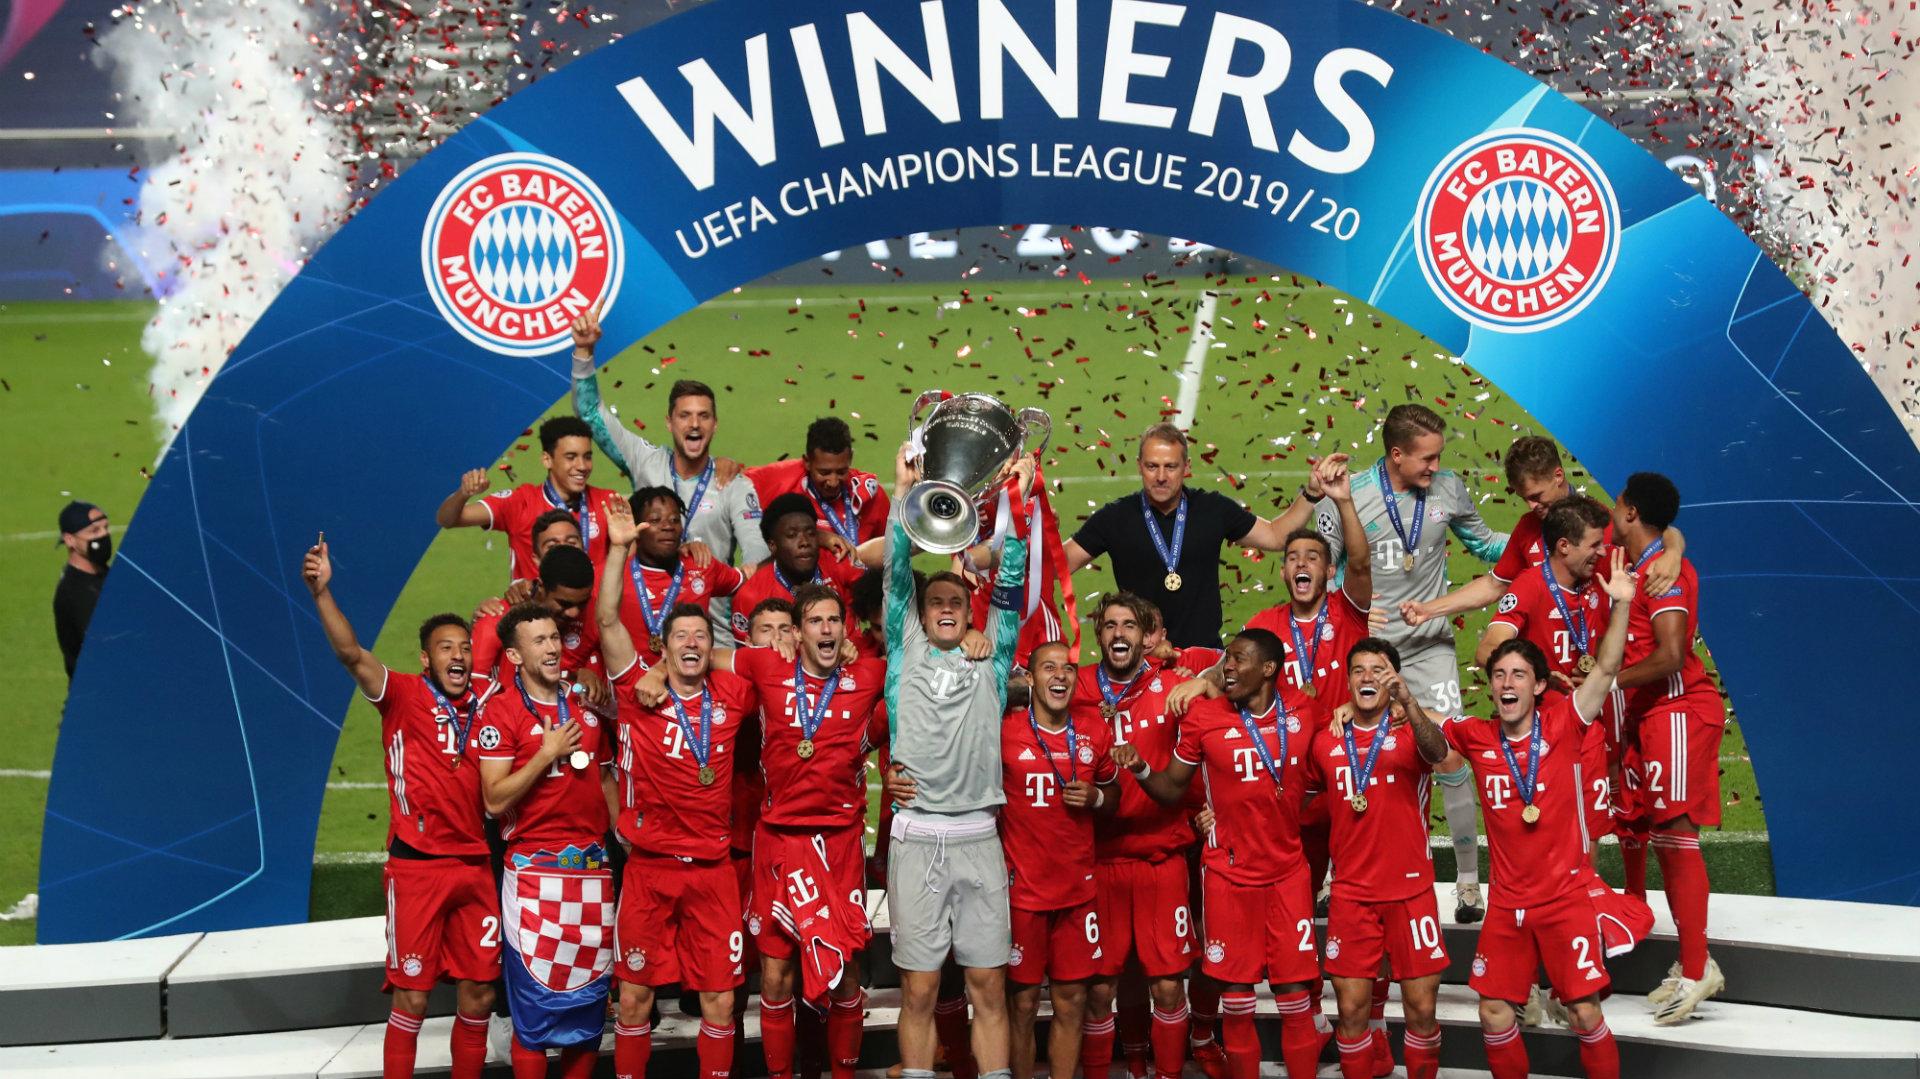 Bayern Munich 'capable of defining an era', claims Salihamidzic